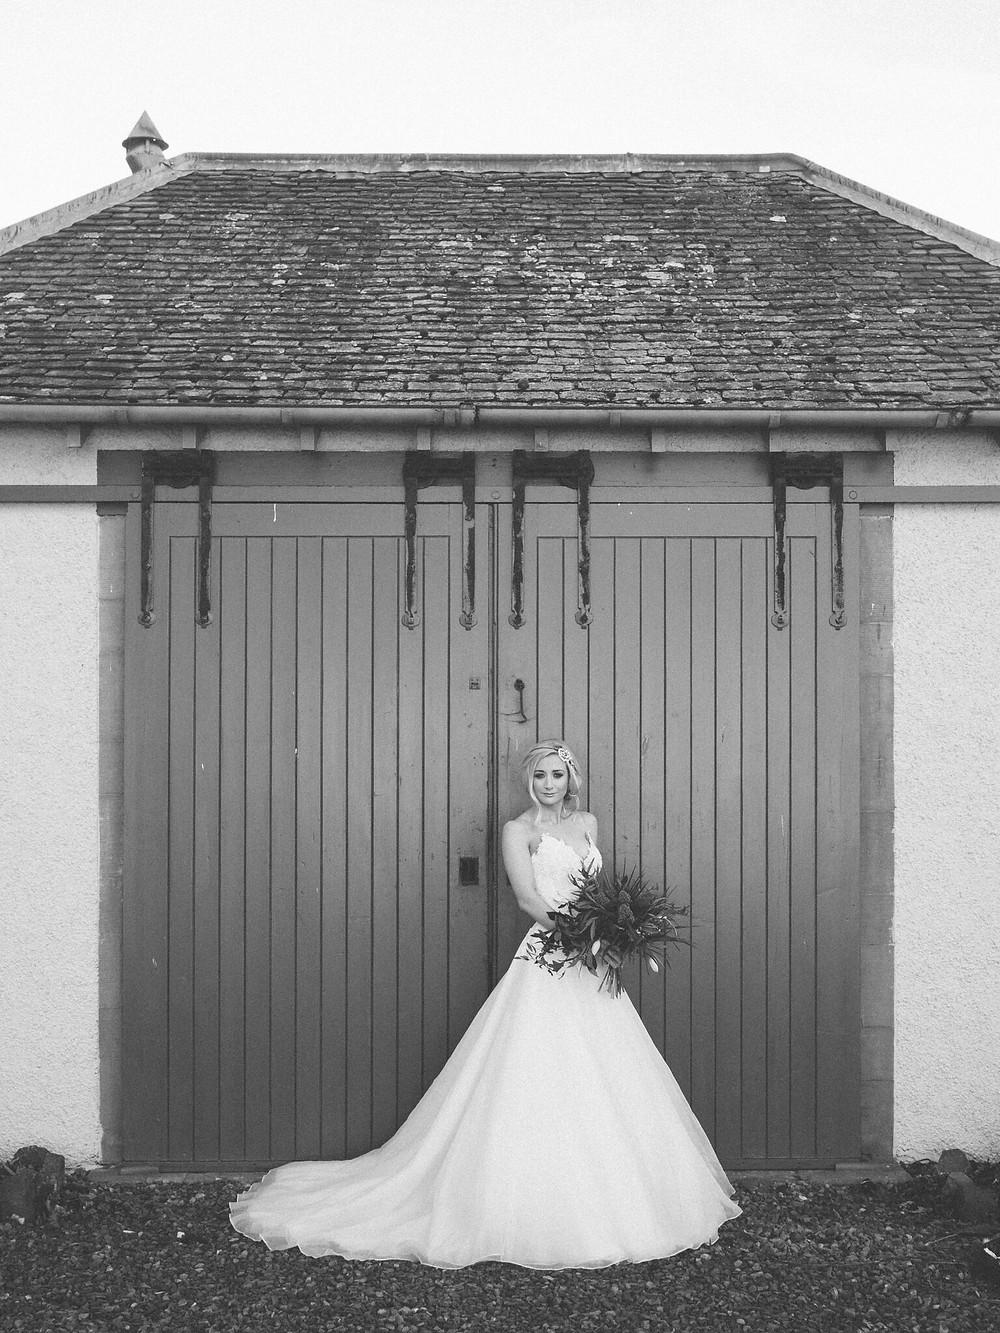 Black & White Photo of Bridge in White Dress holding Boquet